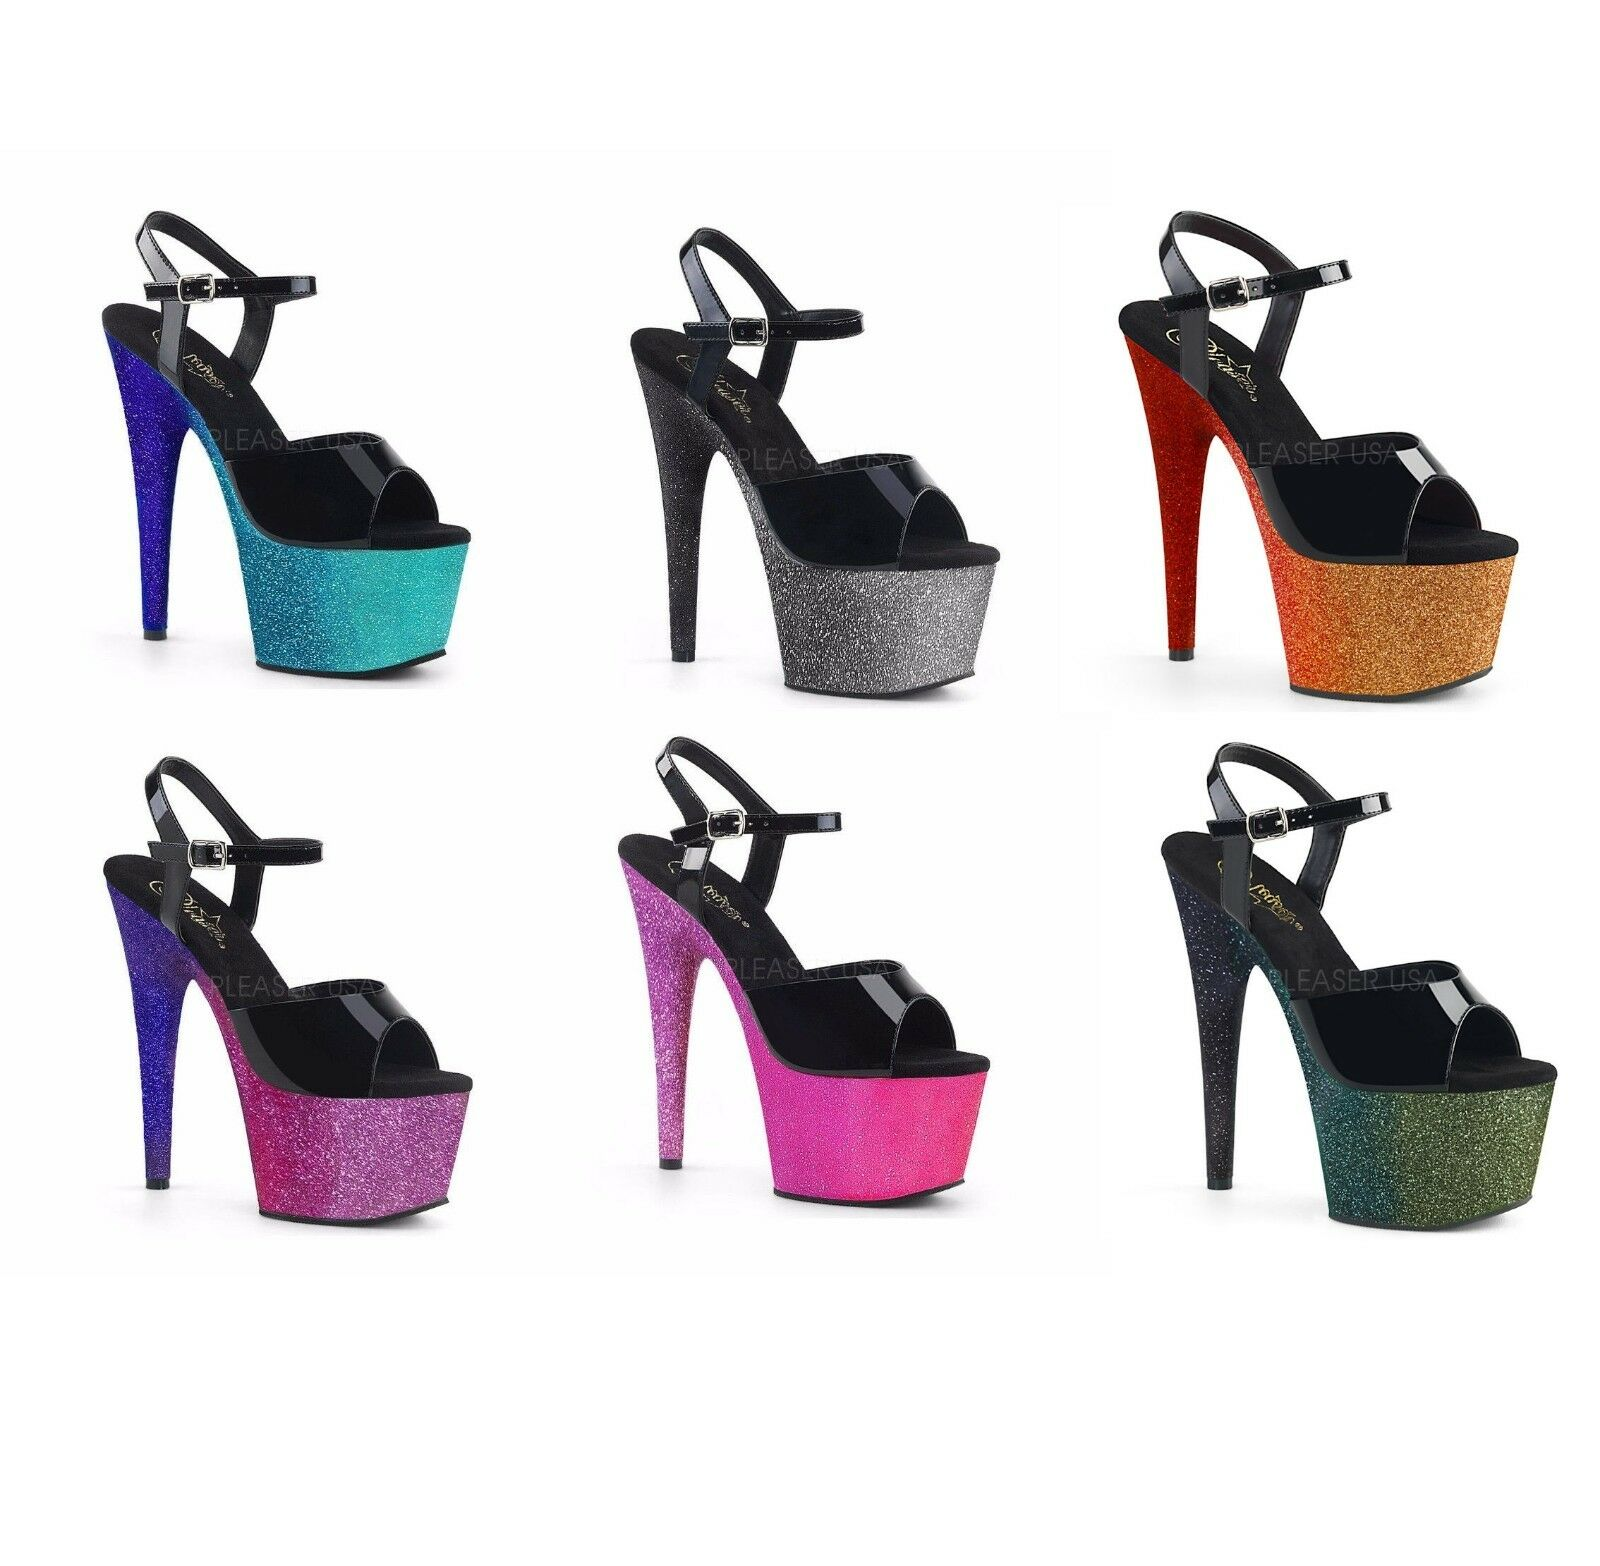 Pleaser ADORE-709OMBRE Exotic Dancing Platform Ankle Strap Sandal Glitters 7